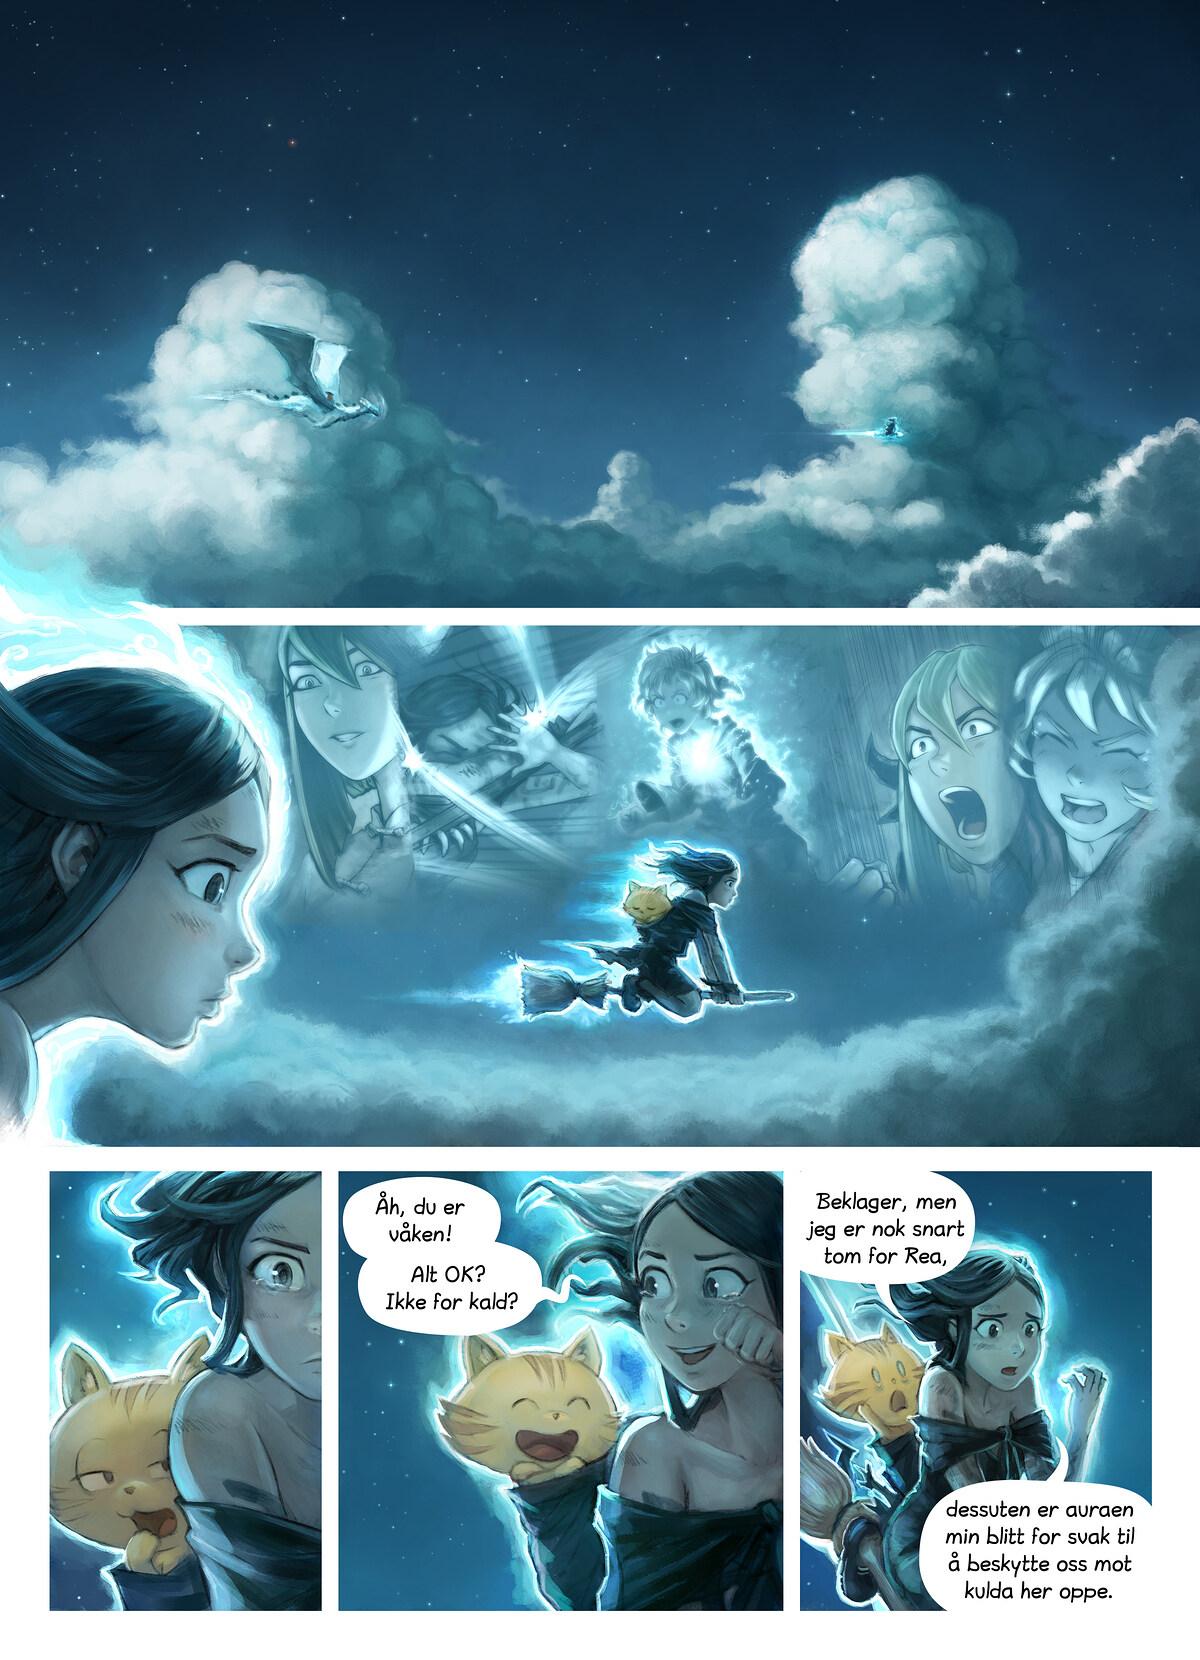 Episode 35: Tid for ettertanke, Page 1